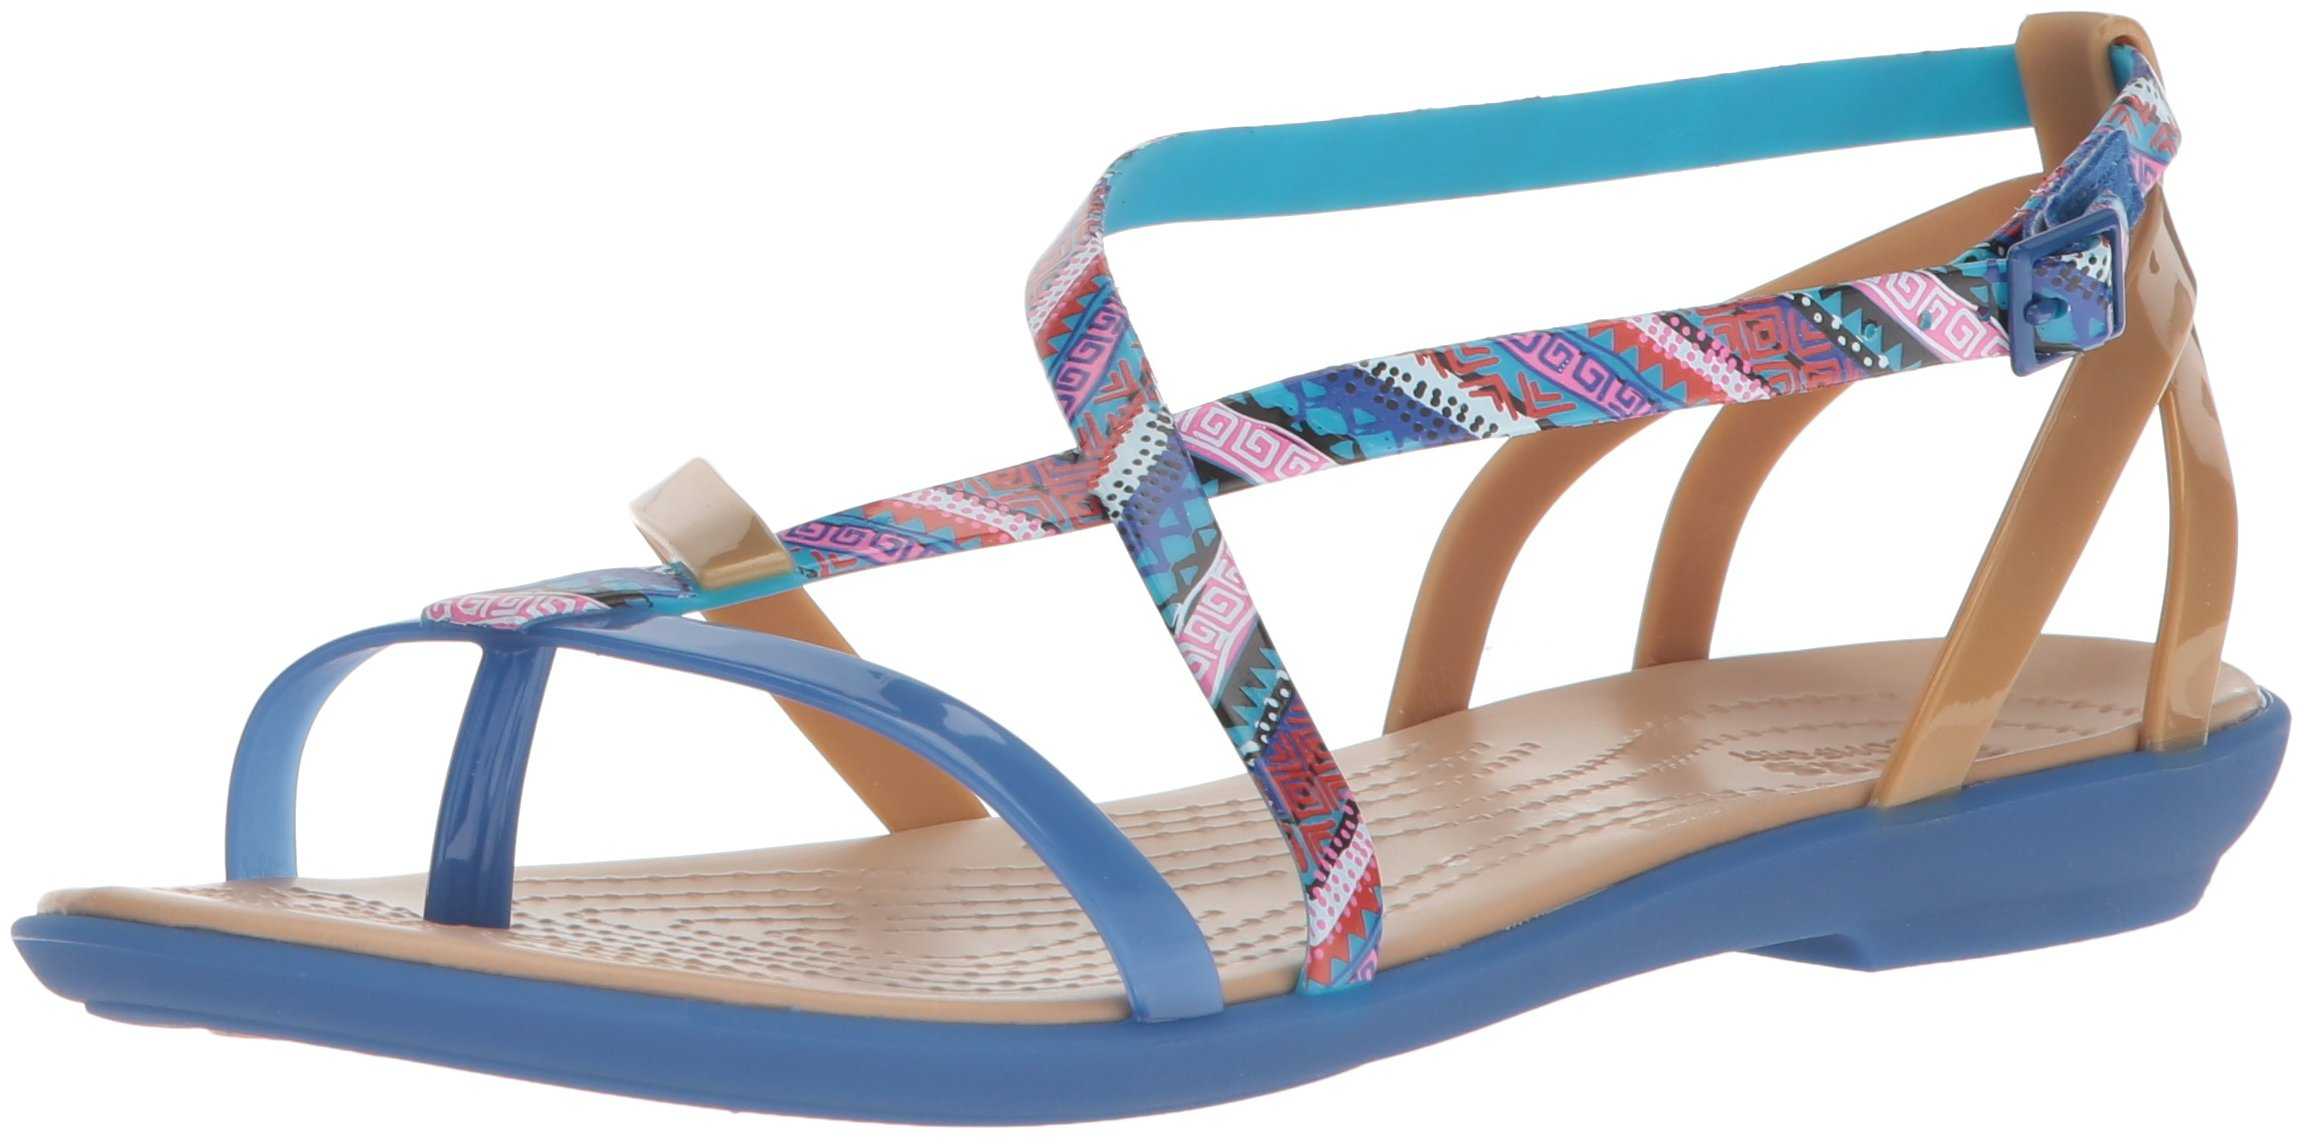 Crocs Women's Isabella Gladiator Flat Sandal, Blue Jean/Gold, 10 M US